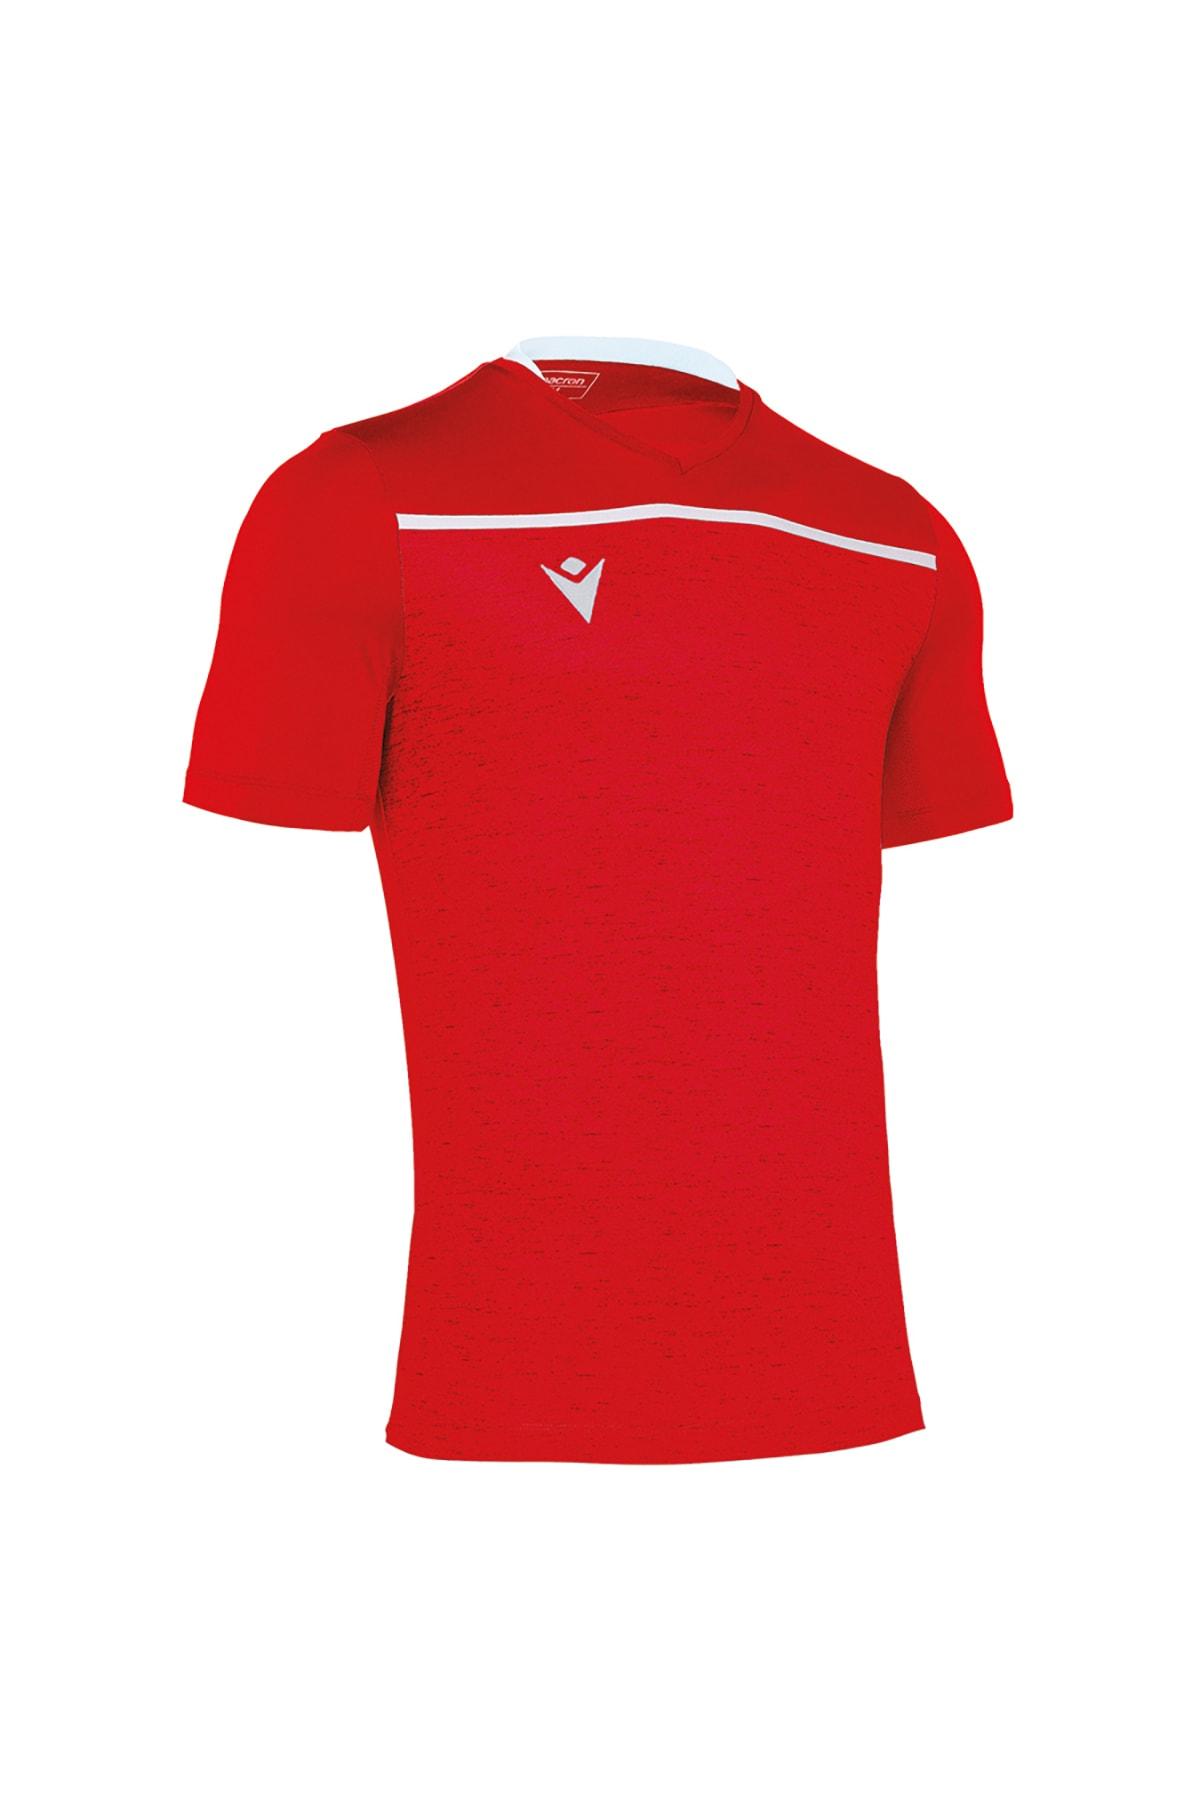 bilcee Macron Kırmızı T-shirt 50630201 2